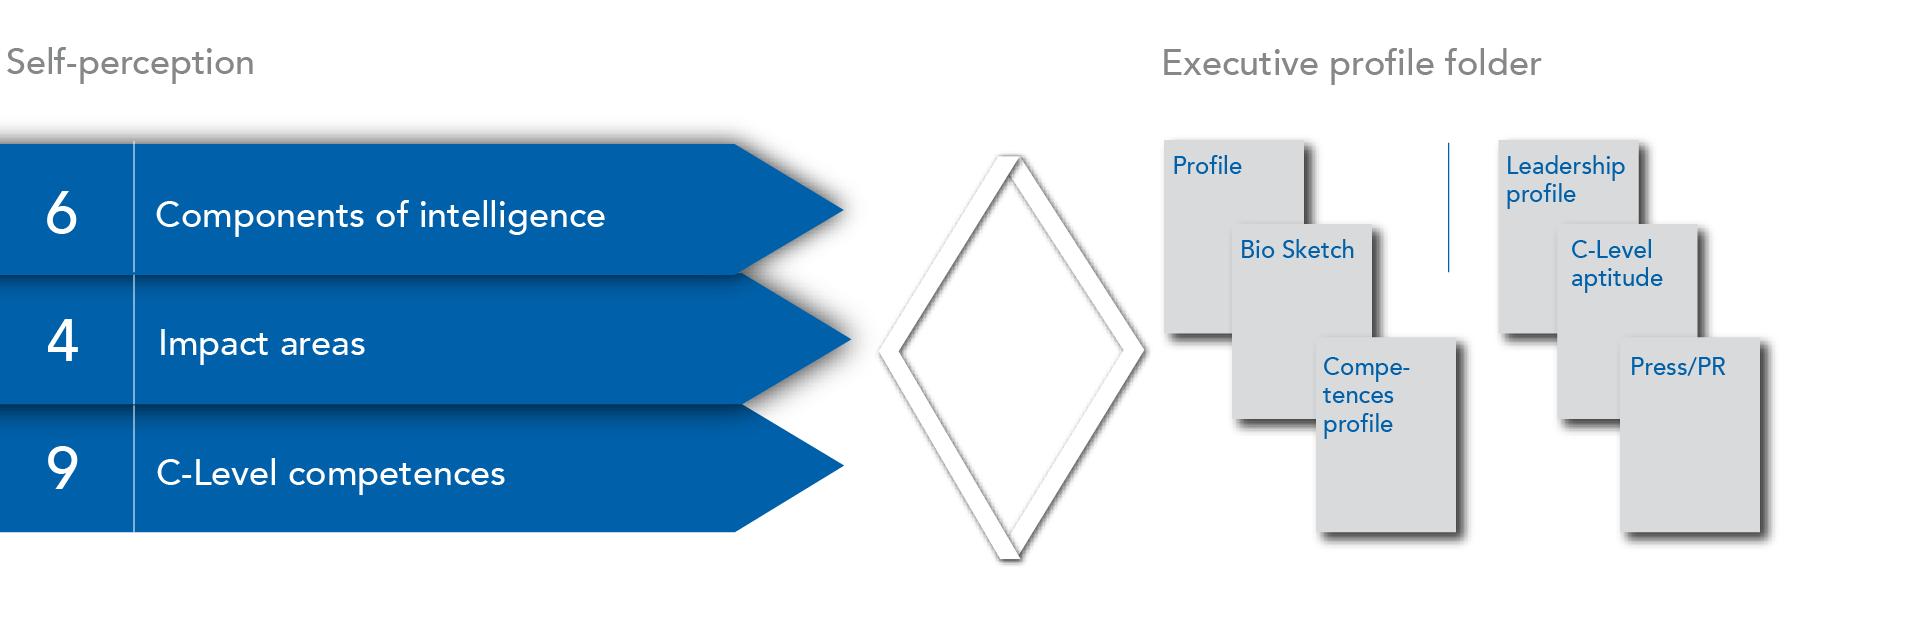 dienstleistungen_exe_profiling_e